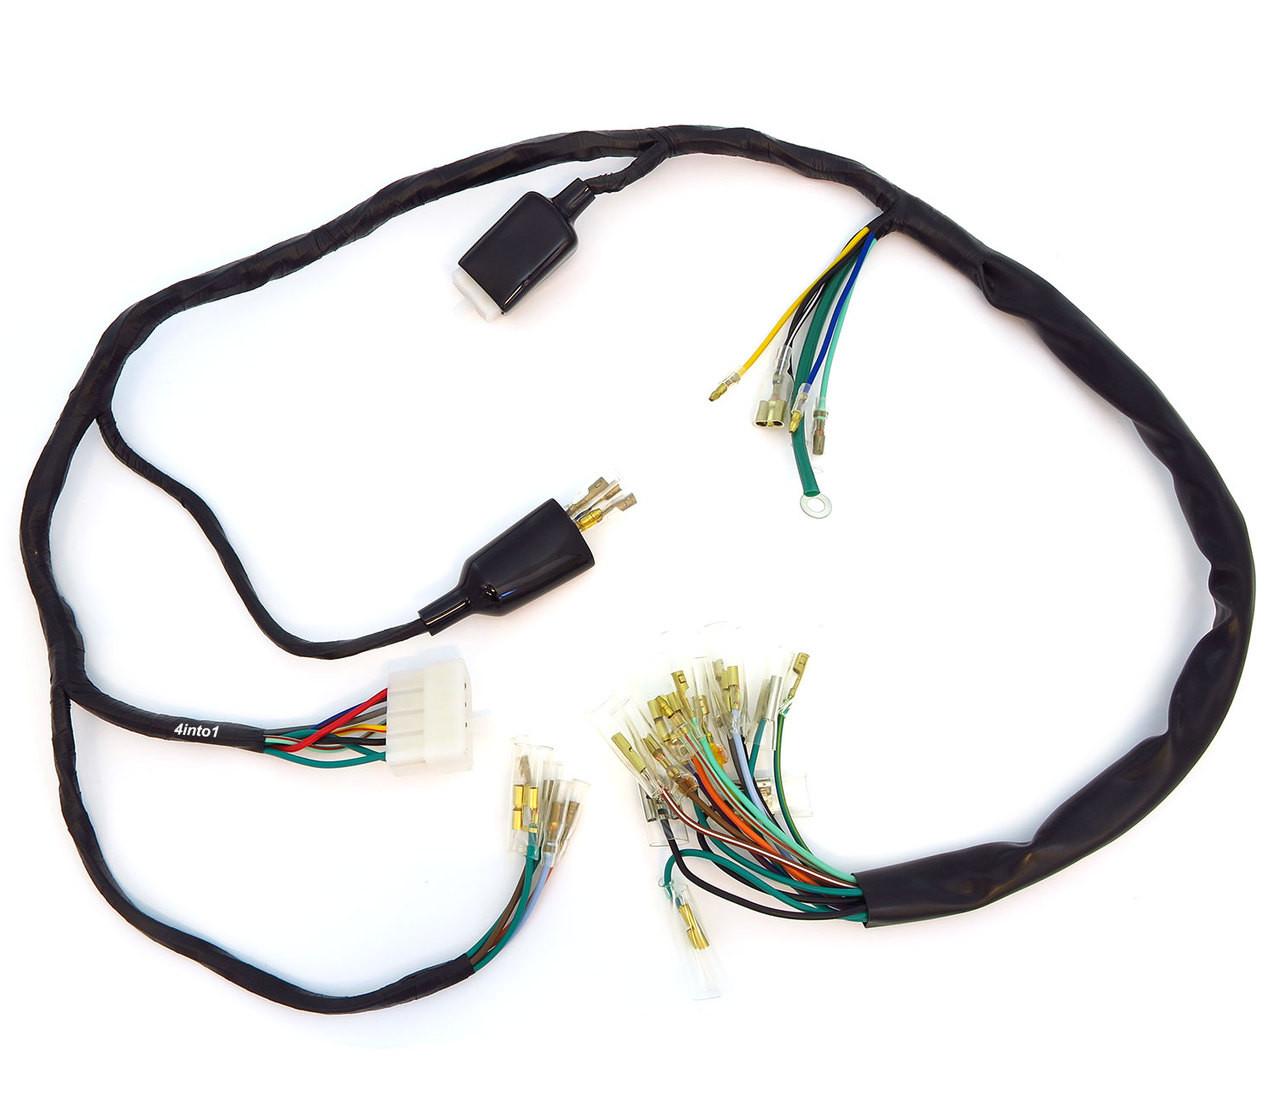 small resolution of main wiring harness 32100 323 040 honda cb500k 1972 1973 honda wiring harness connectors honda wiring harness